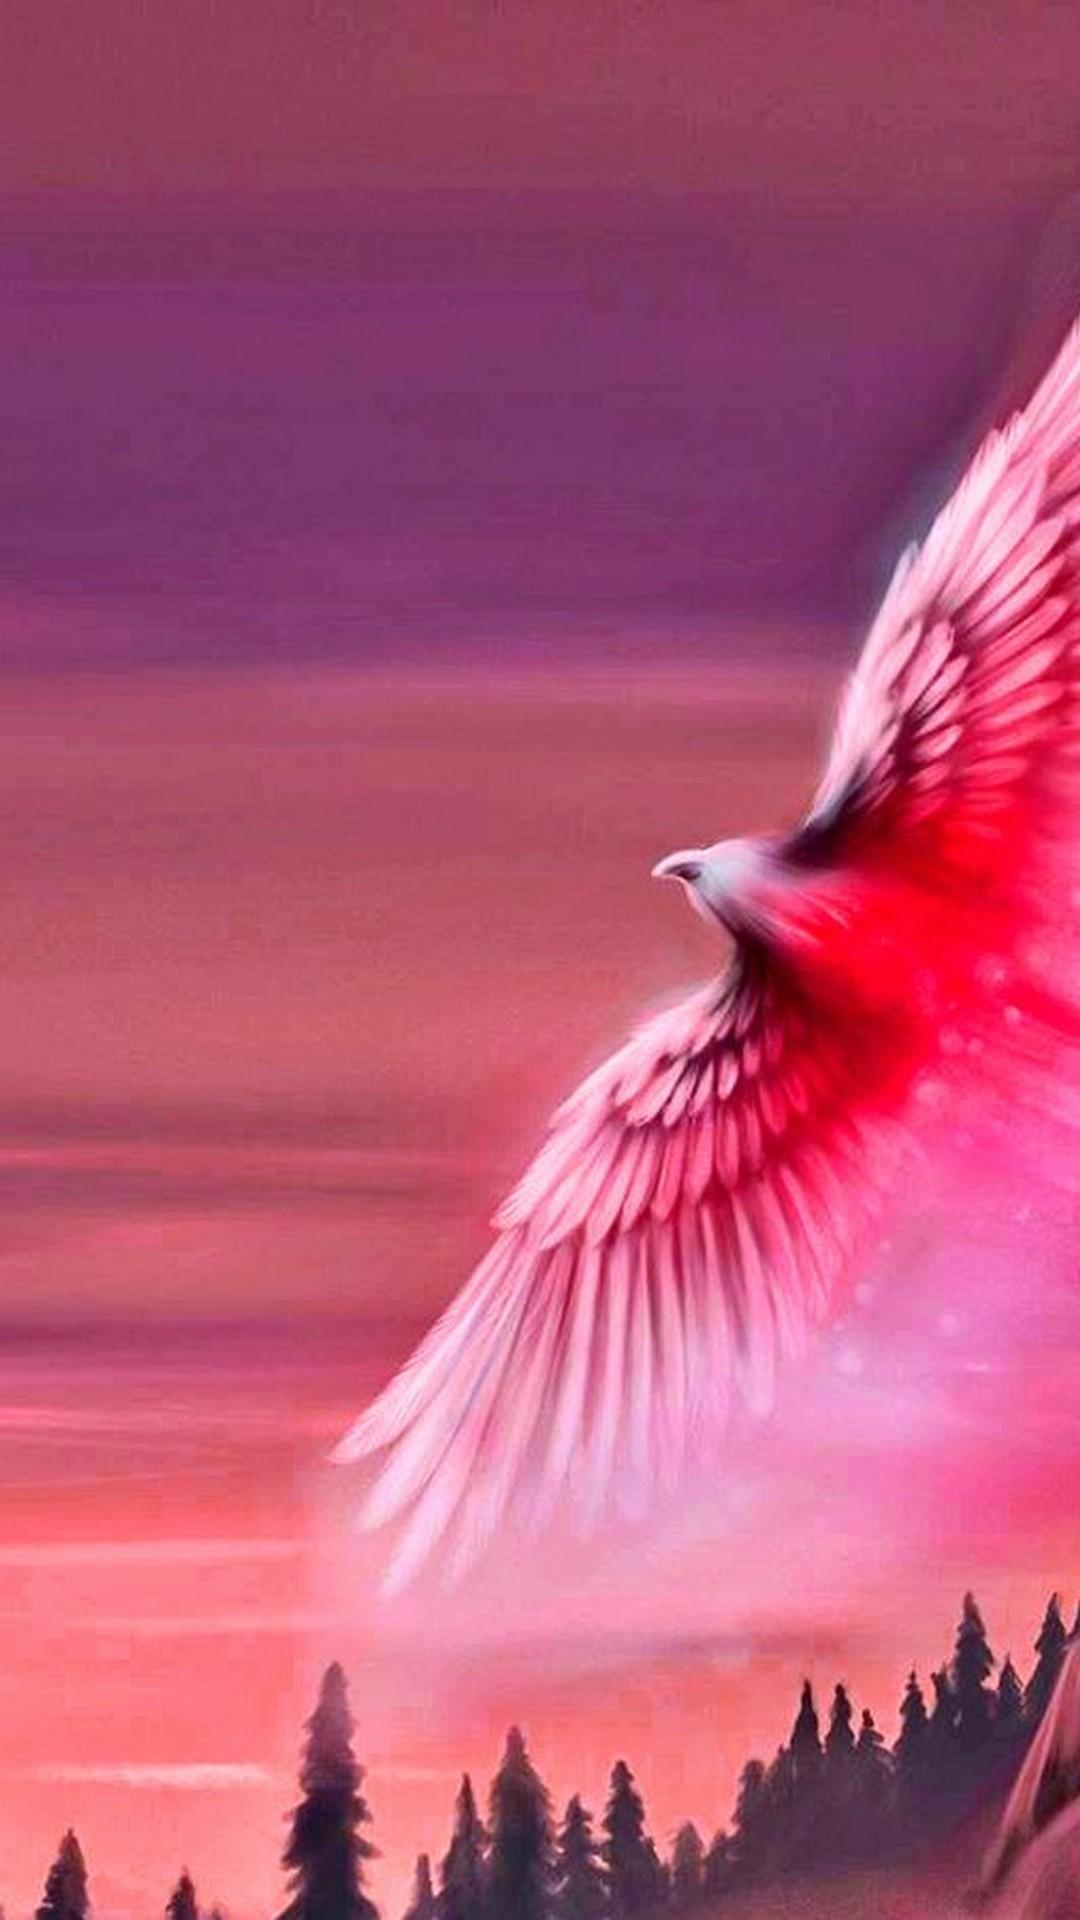 80 Phoenix Bird Wallpapers on WallpaperPlay 1080x1920